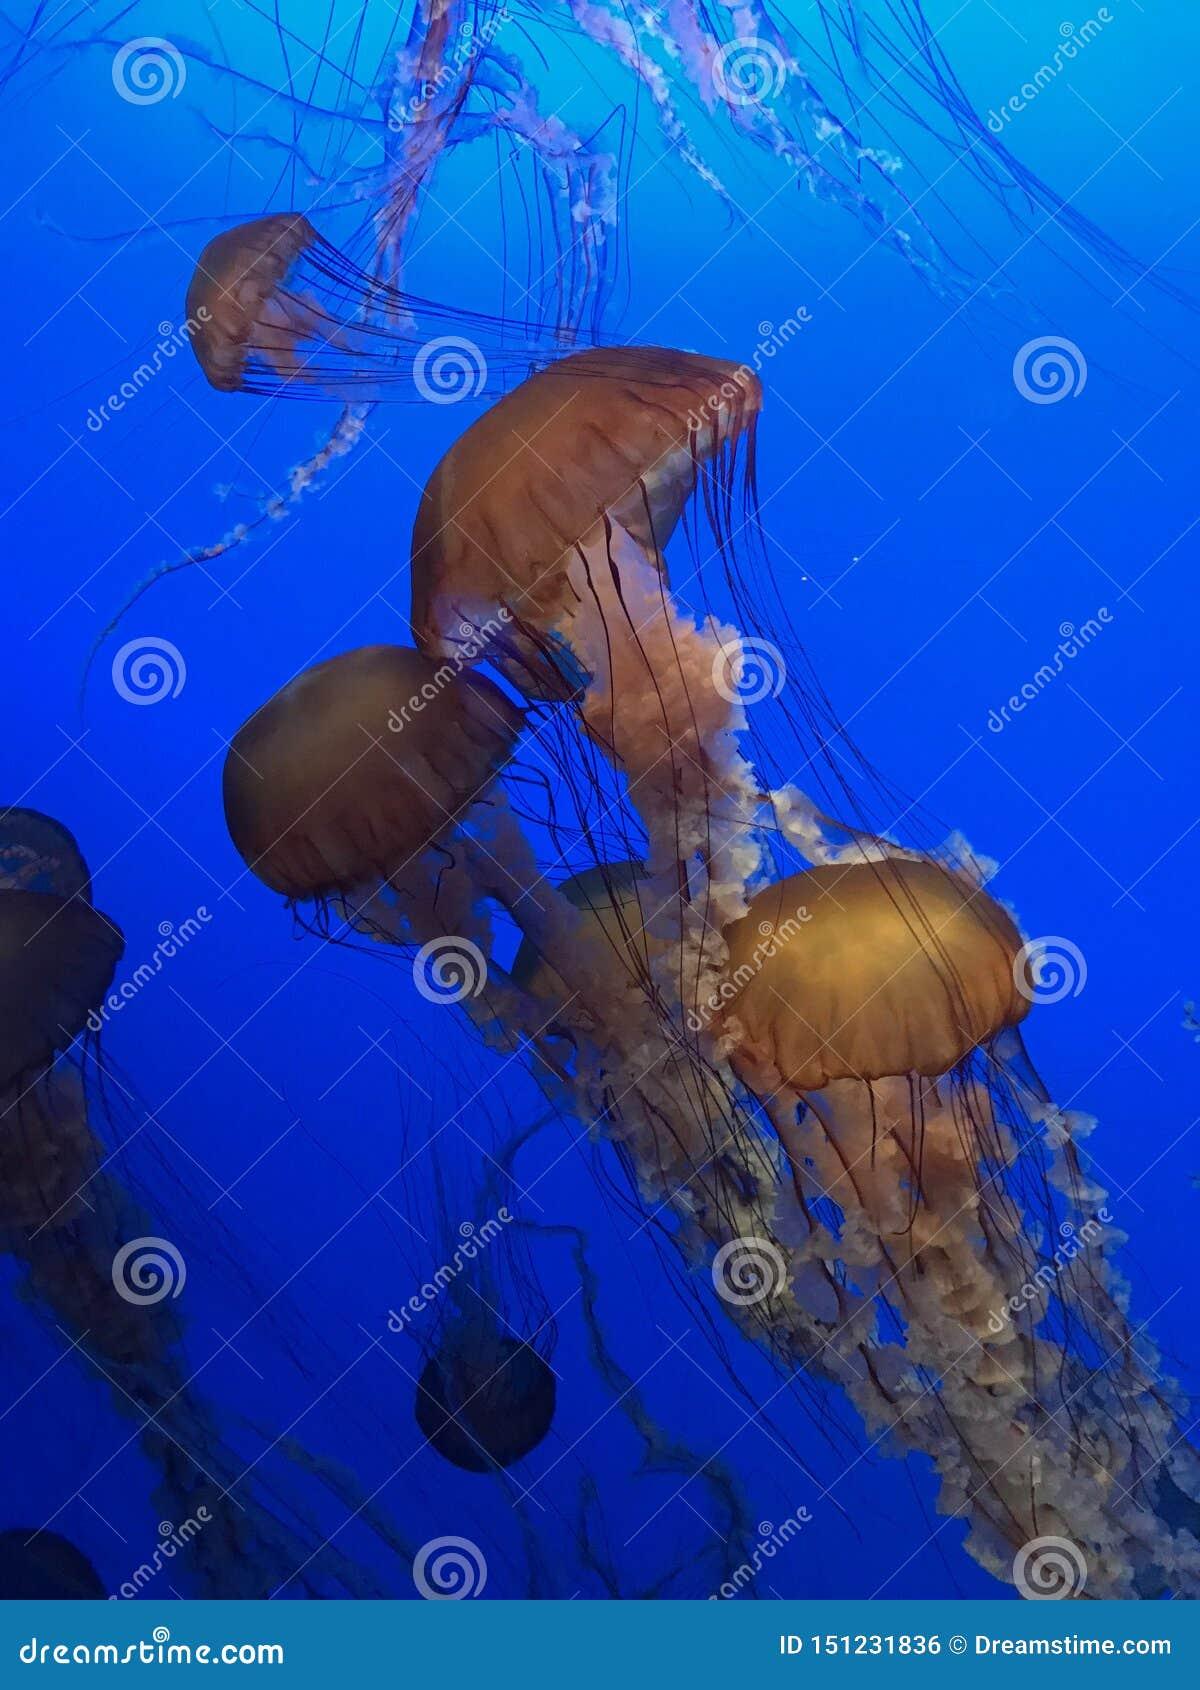 Nettle θάλασσας βαρίδια ψαριών ζελατίνας περίπου στην περίφραξή του